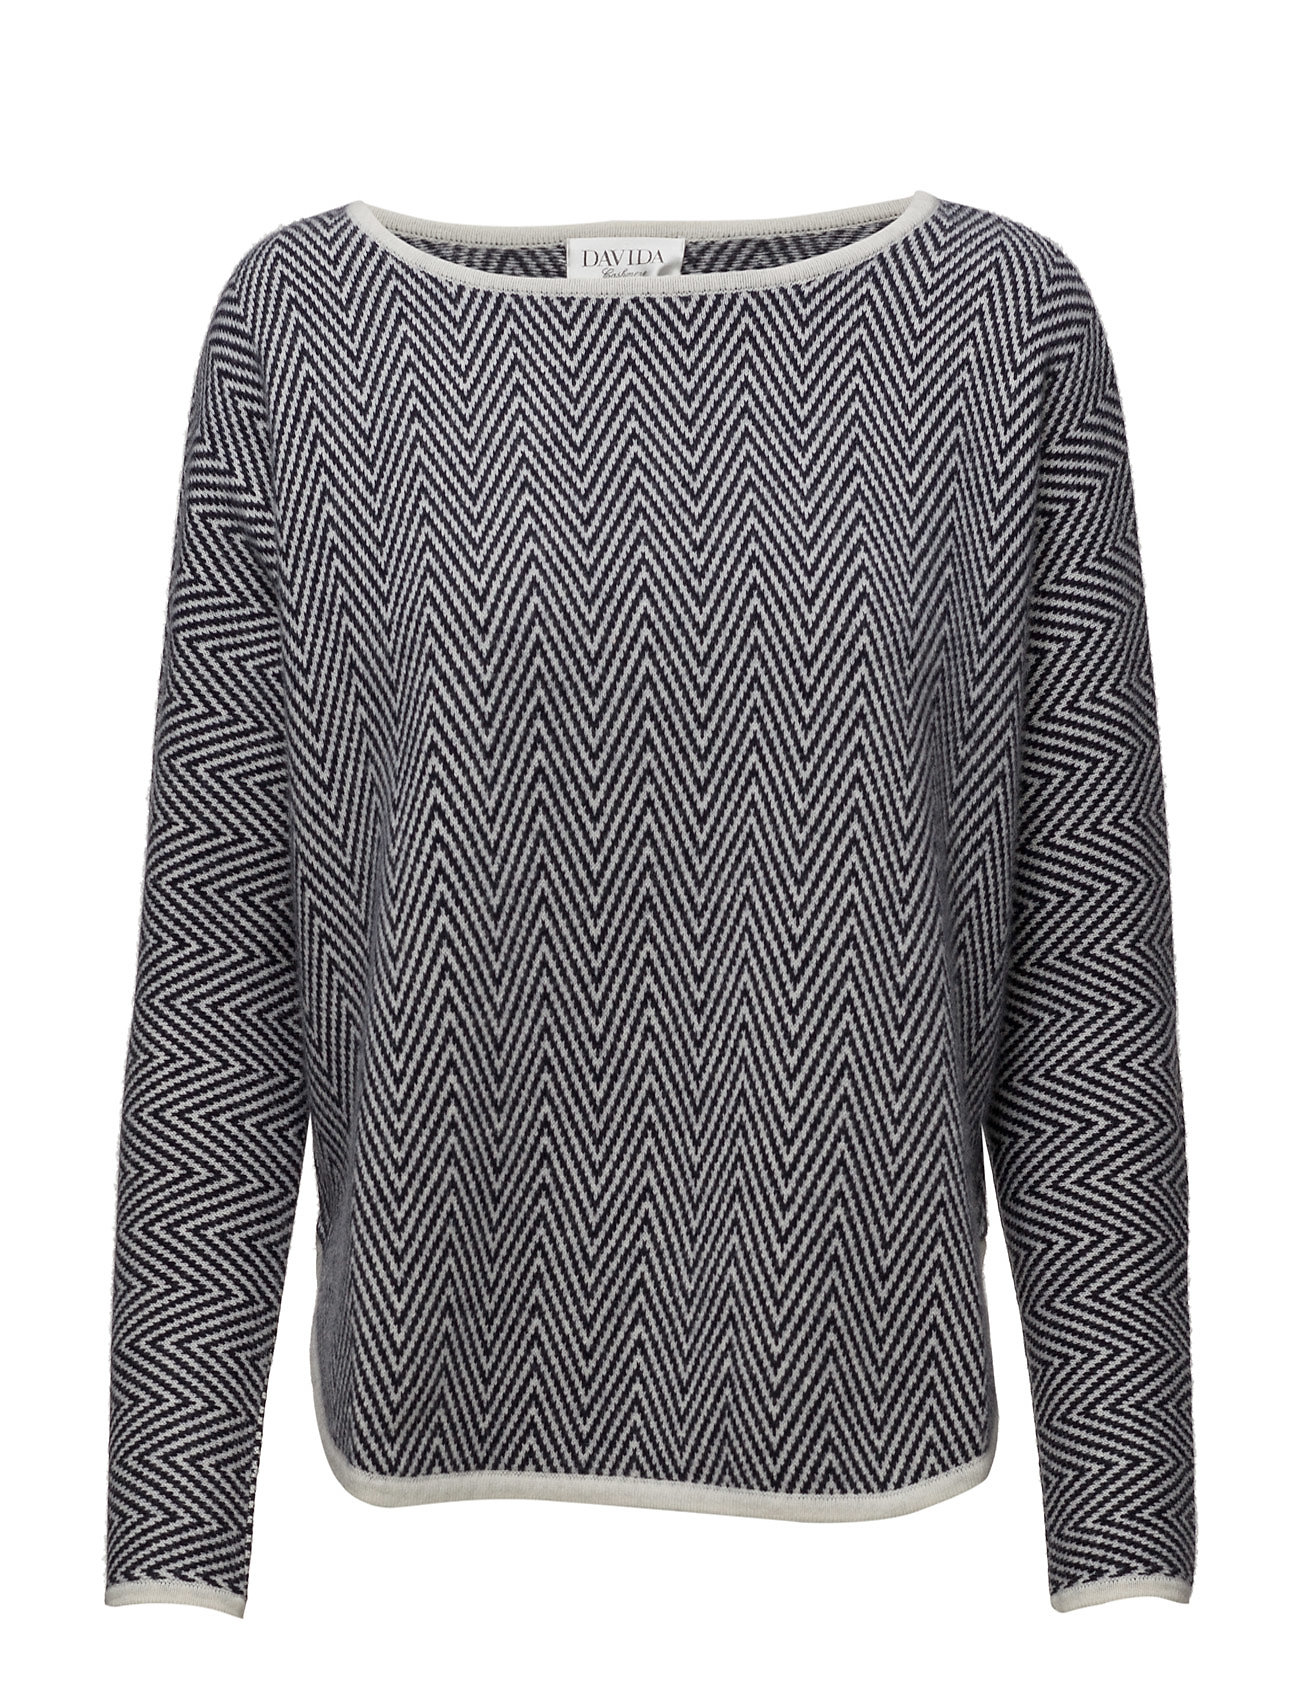 Herringbone Curved Sweater Davida Cashmere Sweatshirts til Damer i